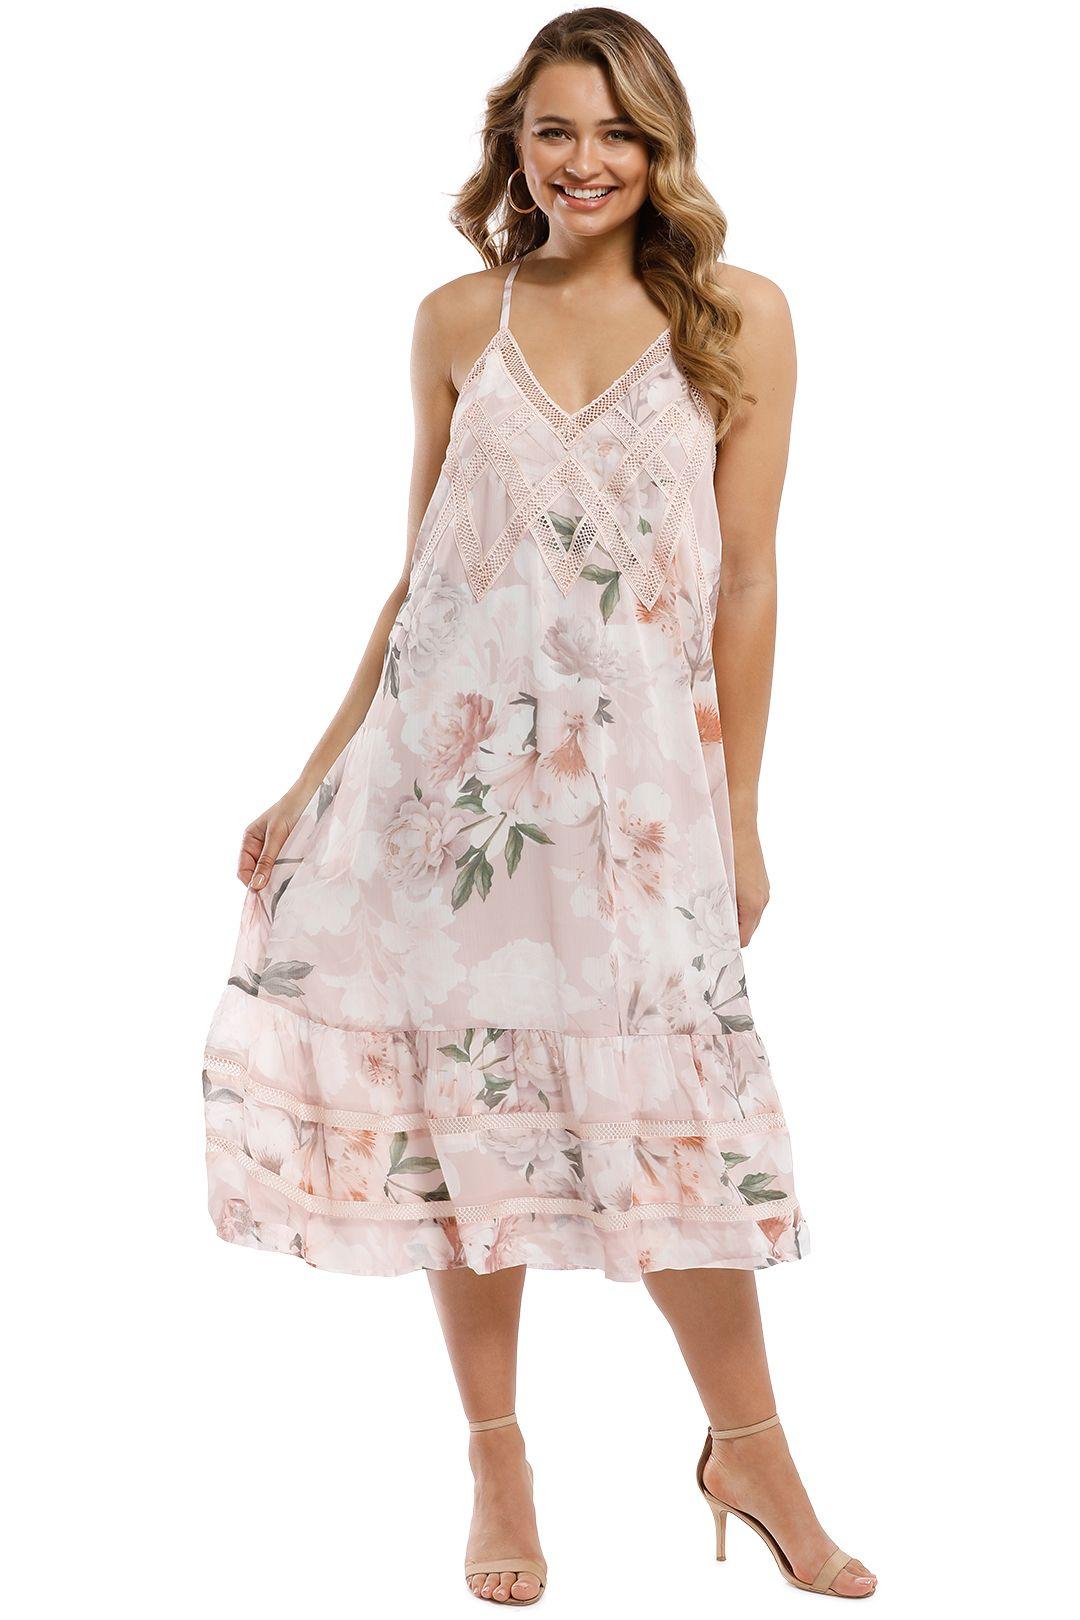 We Are Kindred - Magnolia Midi Dress - Blush Tigerlily - Front